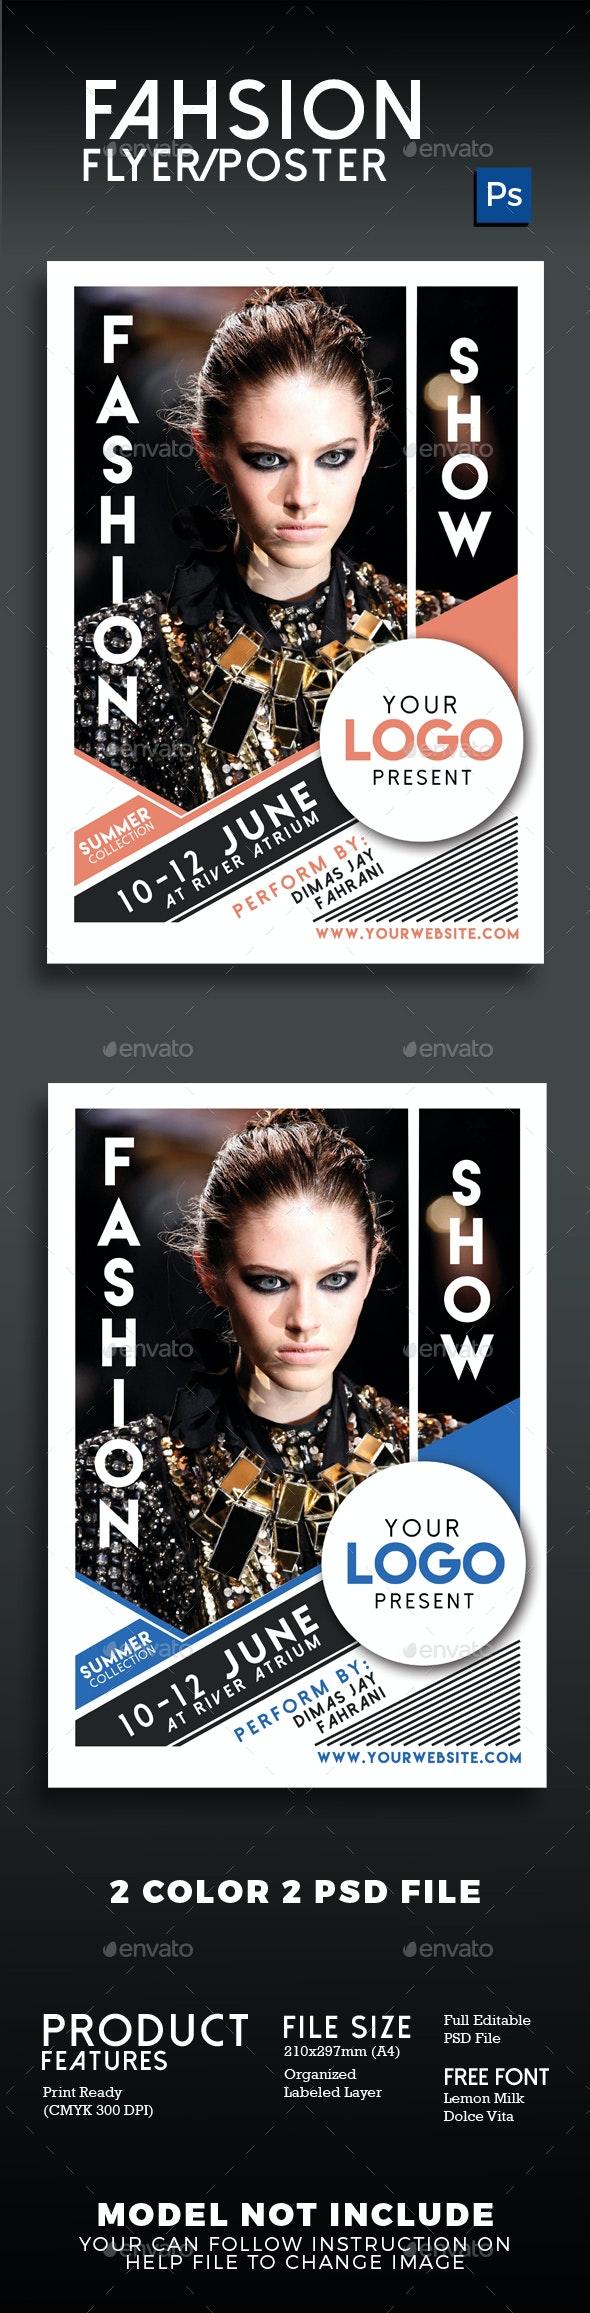 Fashion Show Flyer Poster Vol 2 - Flyers Print Templates